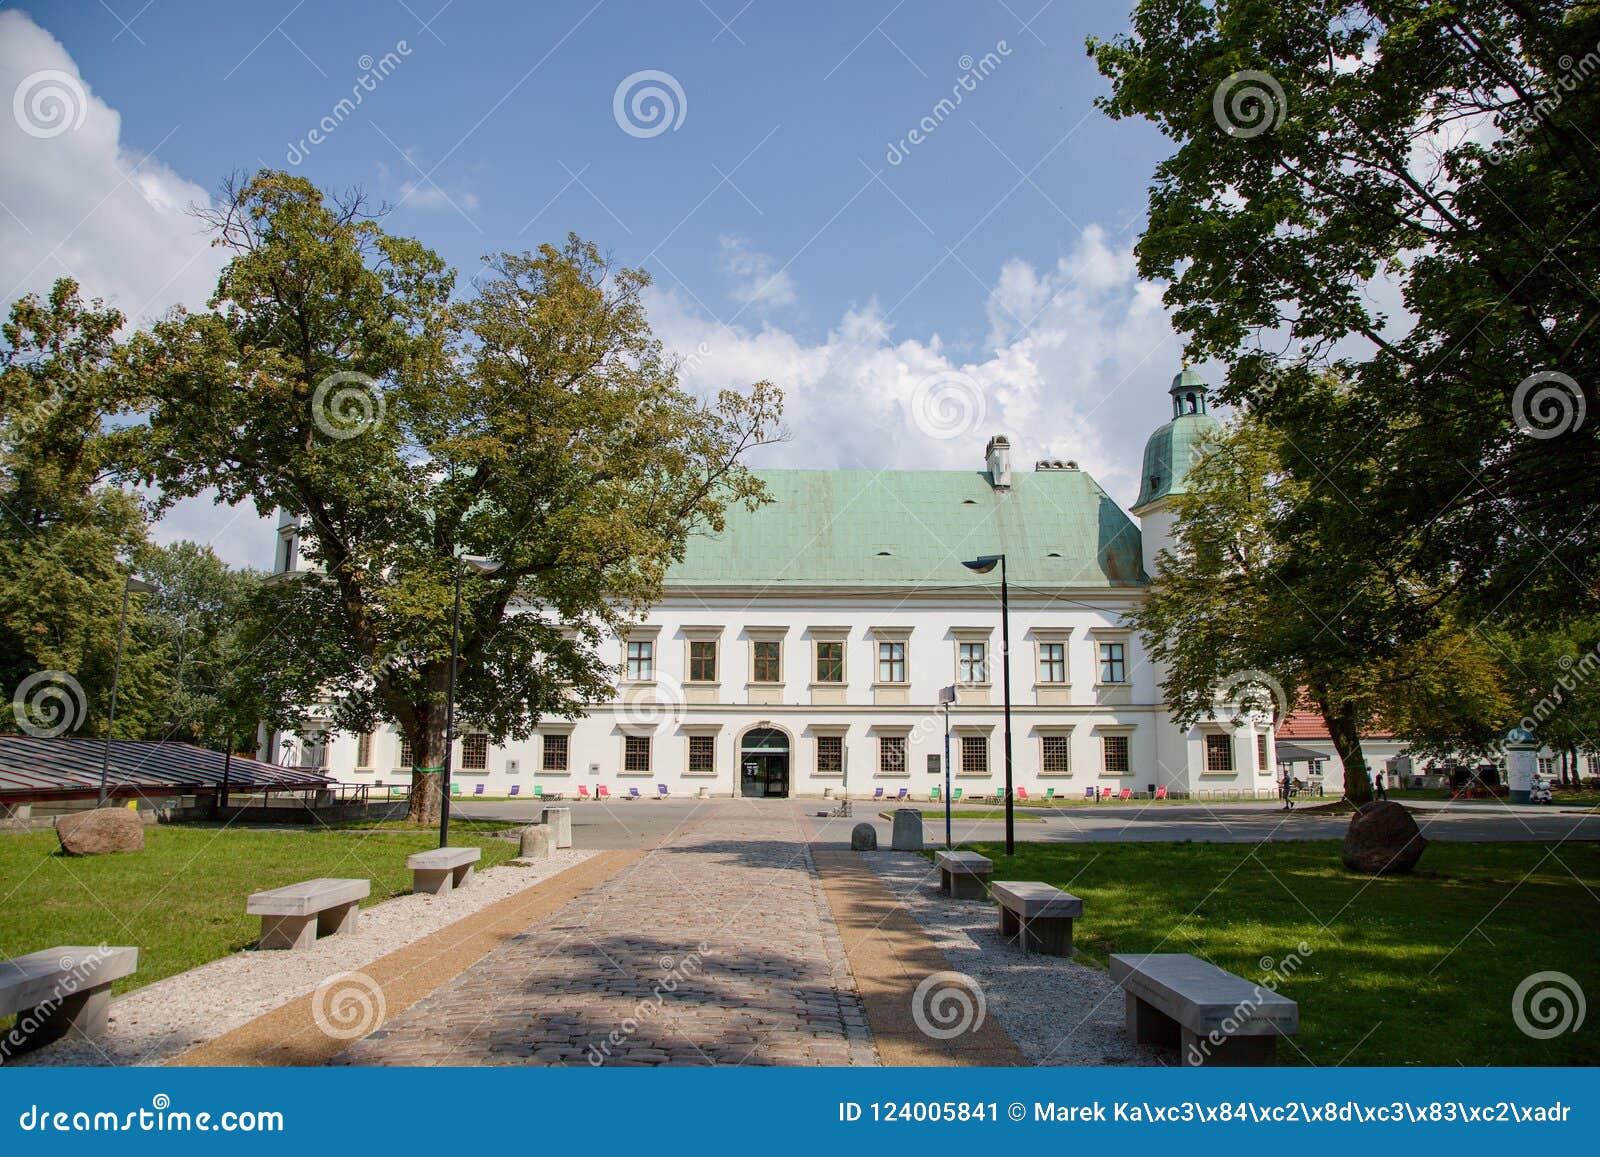 Castillo del ³ w de Ujazdà en Varsovia en Polonia, Europa